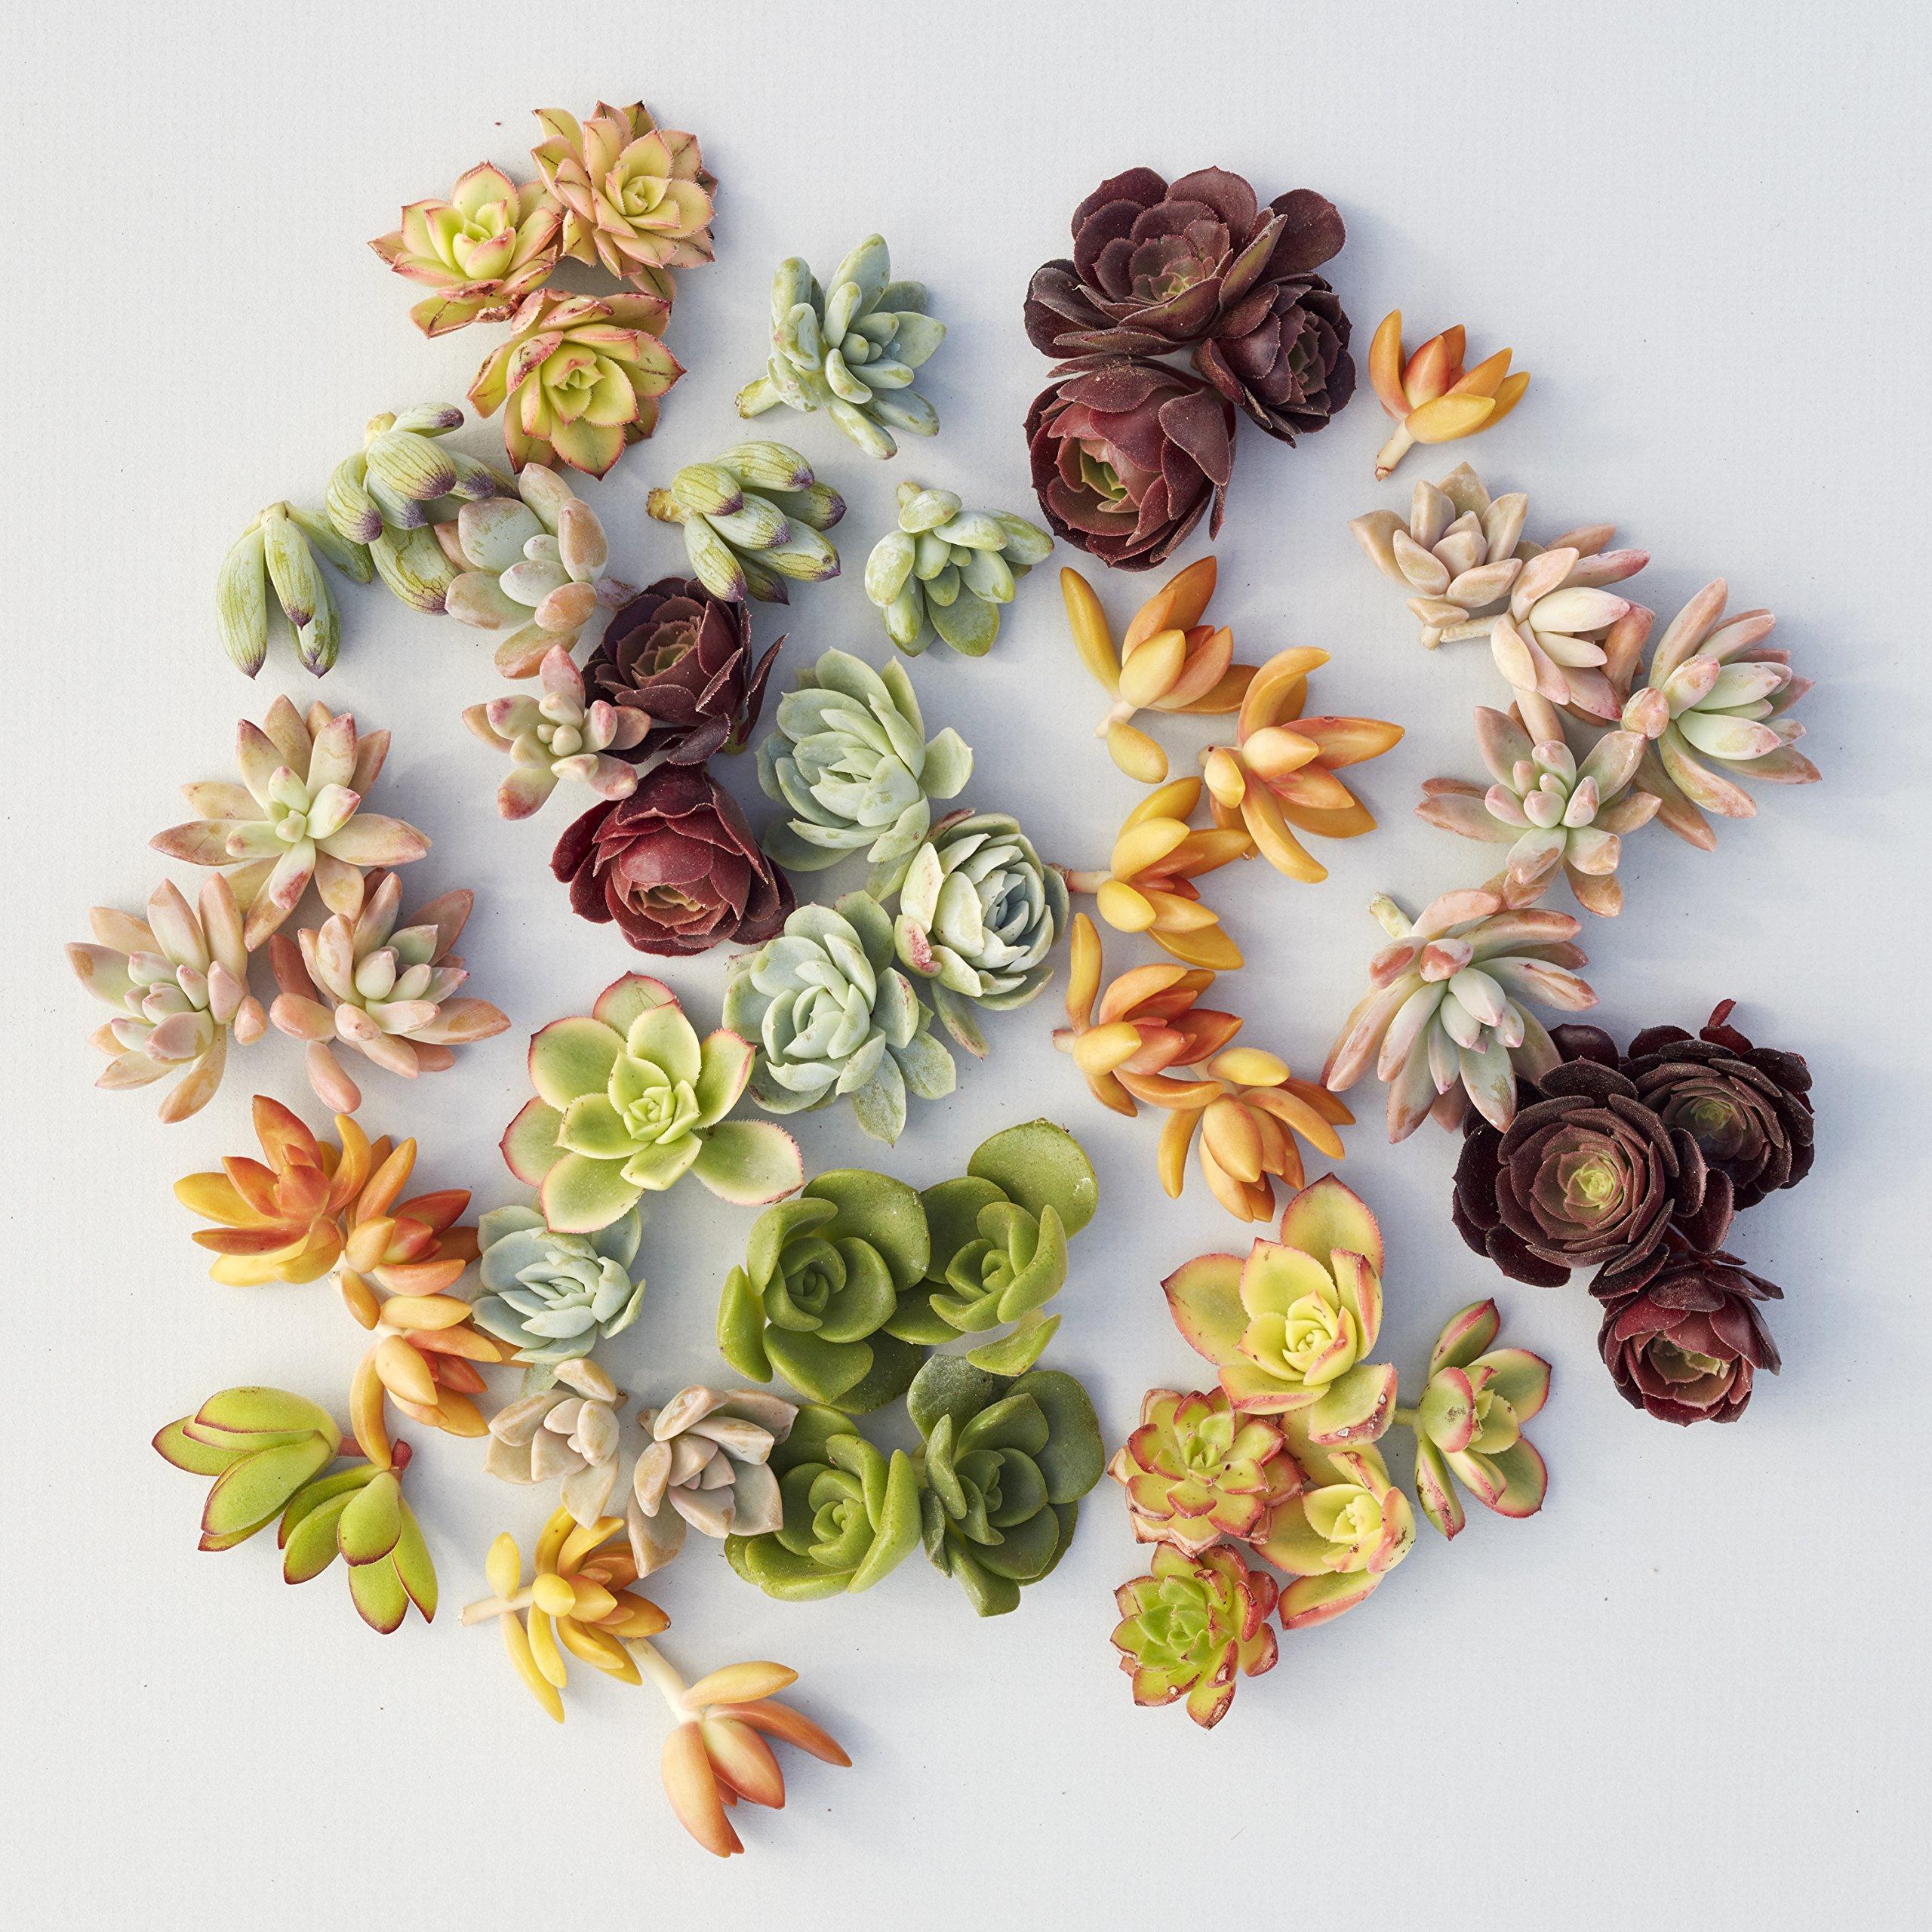 Succulent Gardens Set of 100 Assorted Succulent Cuttings Plant, Multicolor by Succulent Gardens (Image #1)